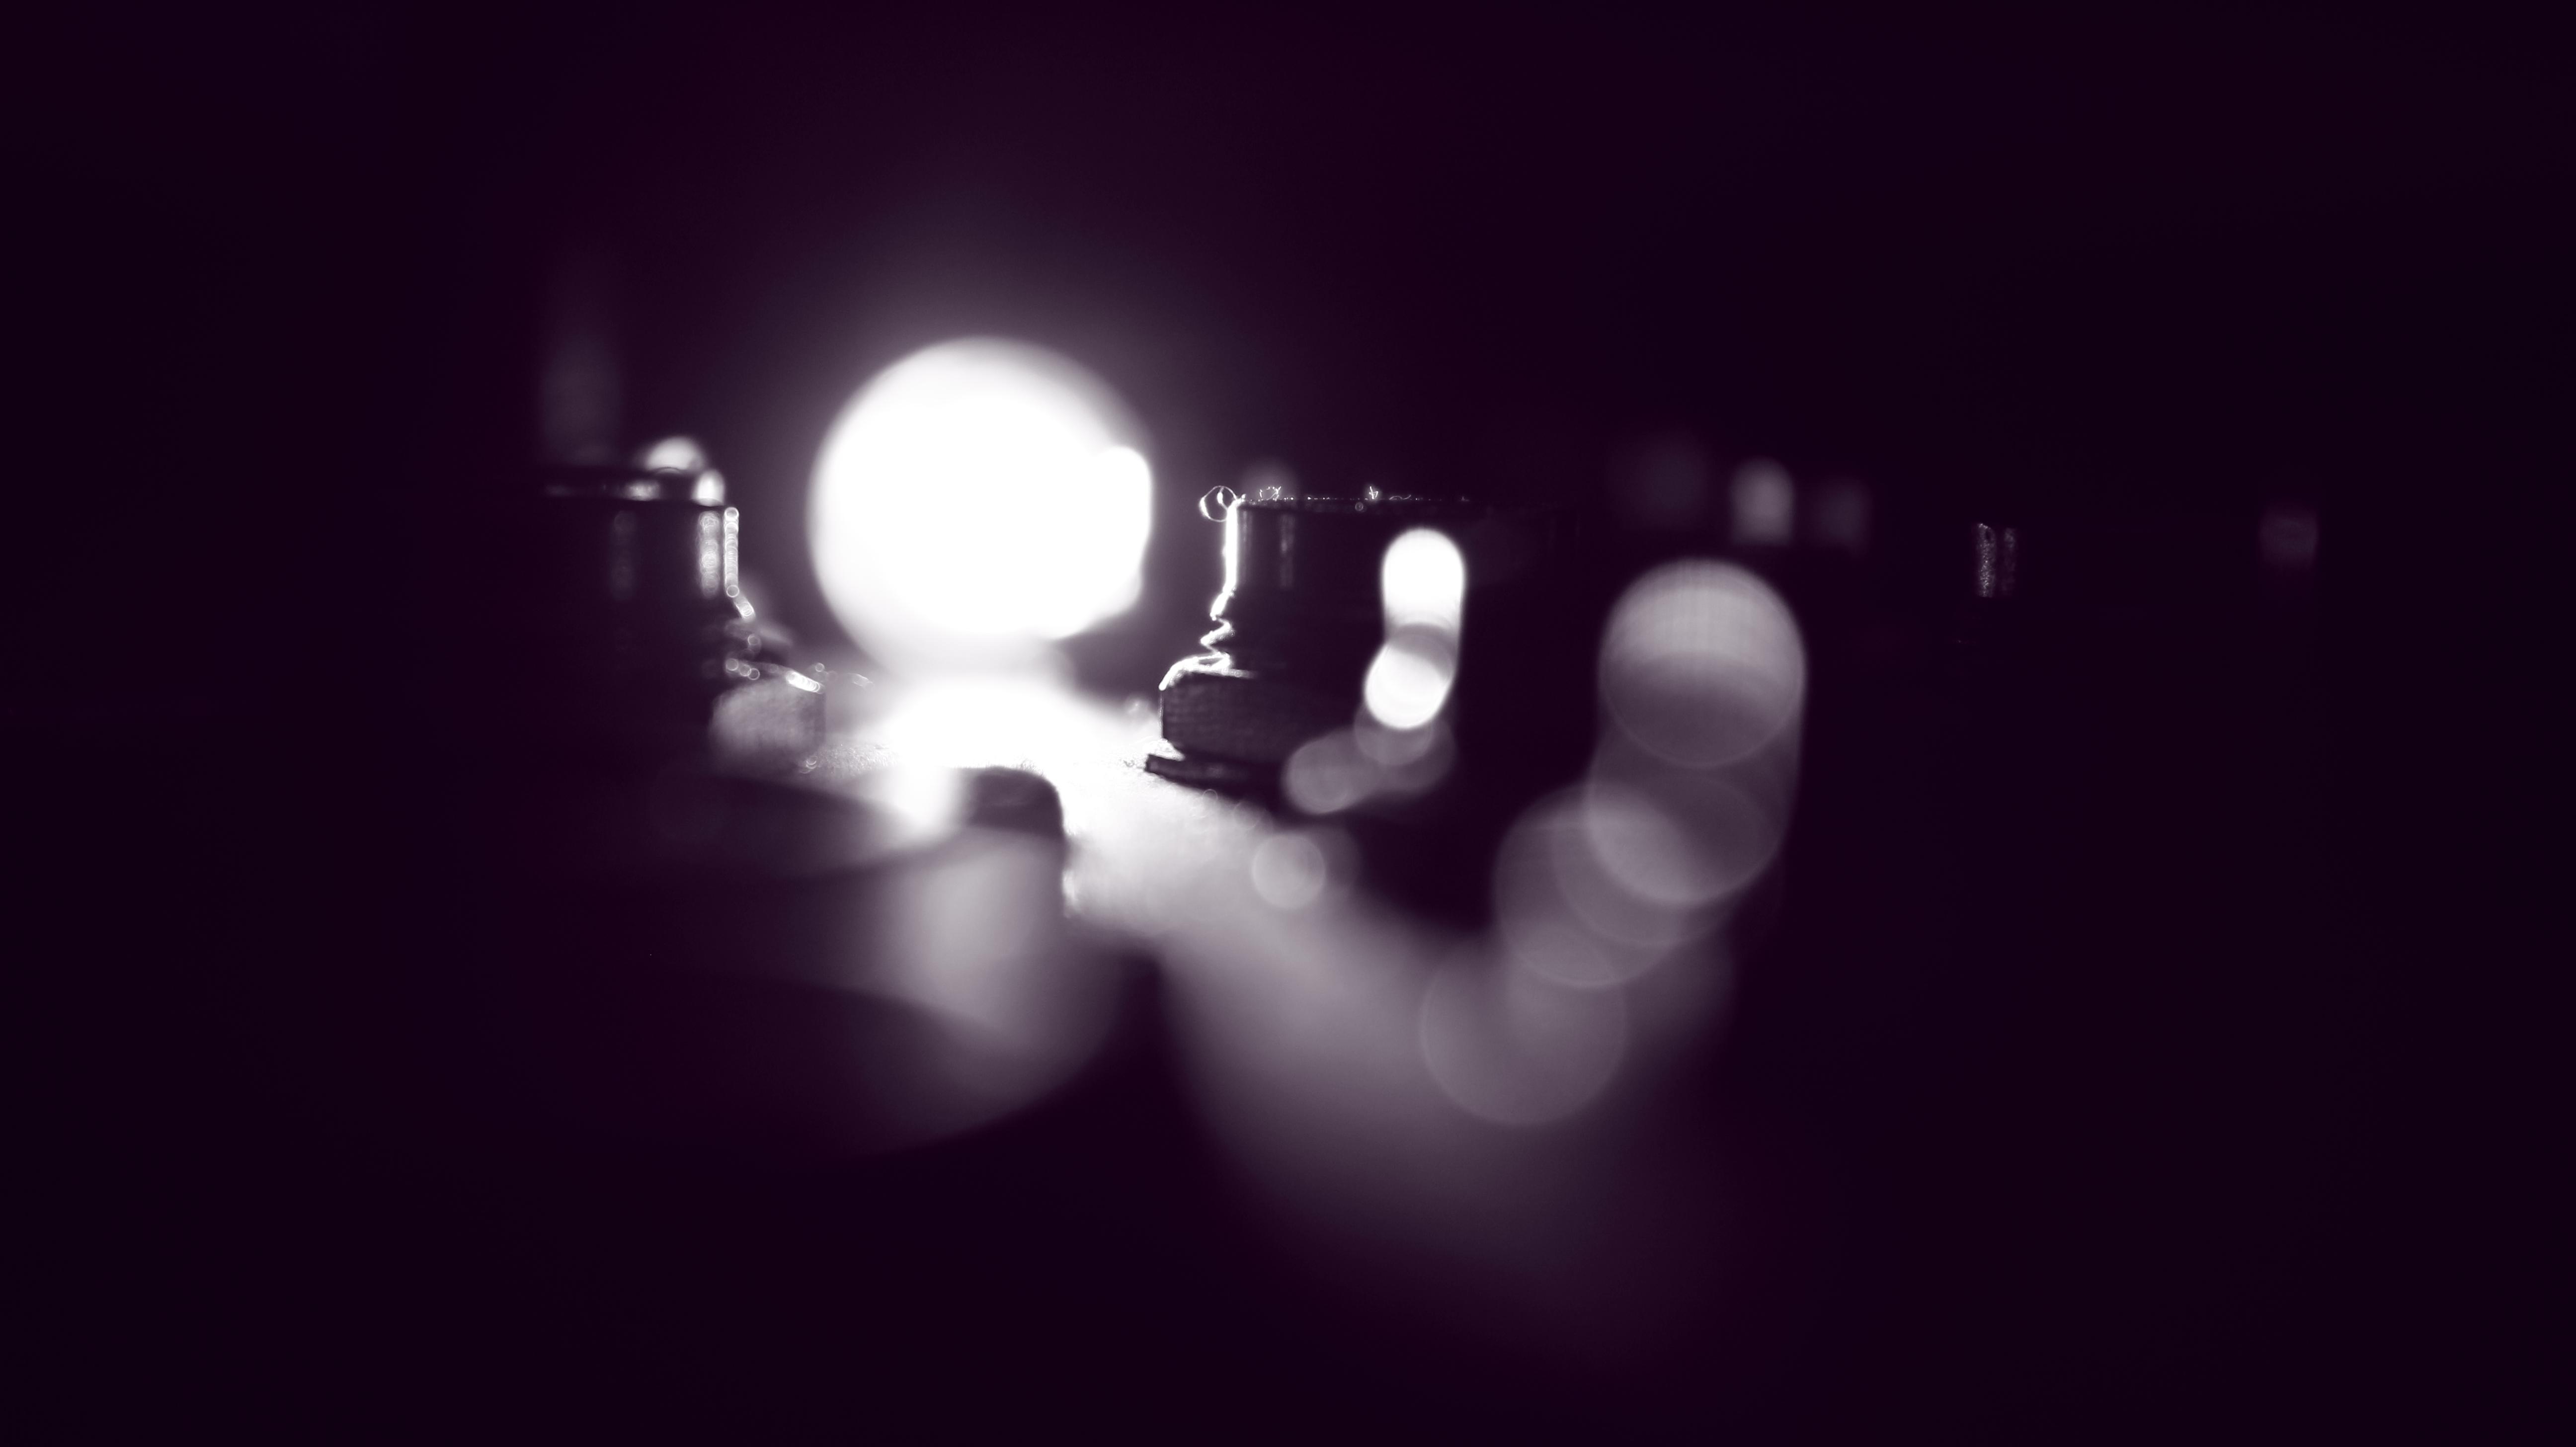 Fotos gratis : ligero, Bokeh, difuminar, abstracto, en blanco y negro, oscuro, color, oscuridad, iluminación, destacar, circulo, iluminado, Lente de bengala, art, destello, luces, atención, diseño, brillante, forma, Fotografía monocroma, Papel pintado de la computadora, luminiscencia 5184x2912